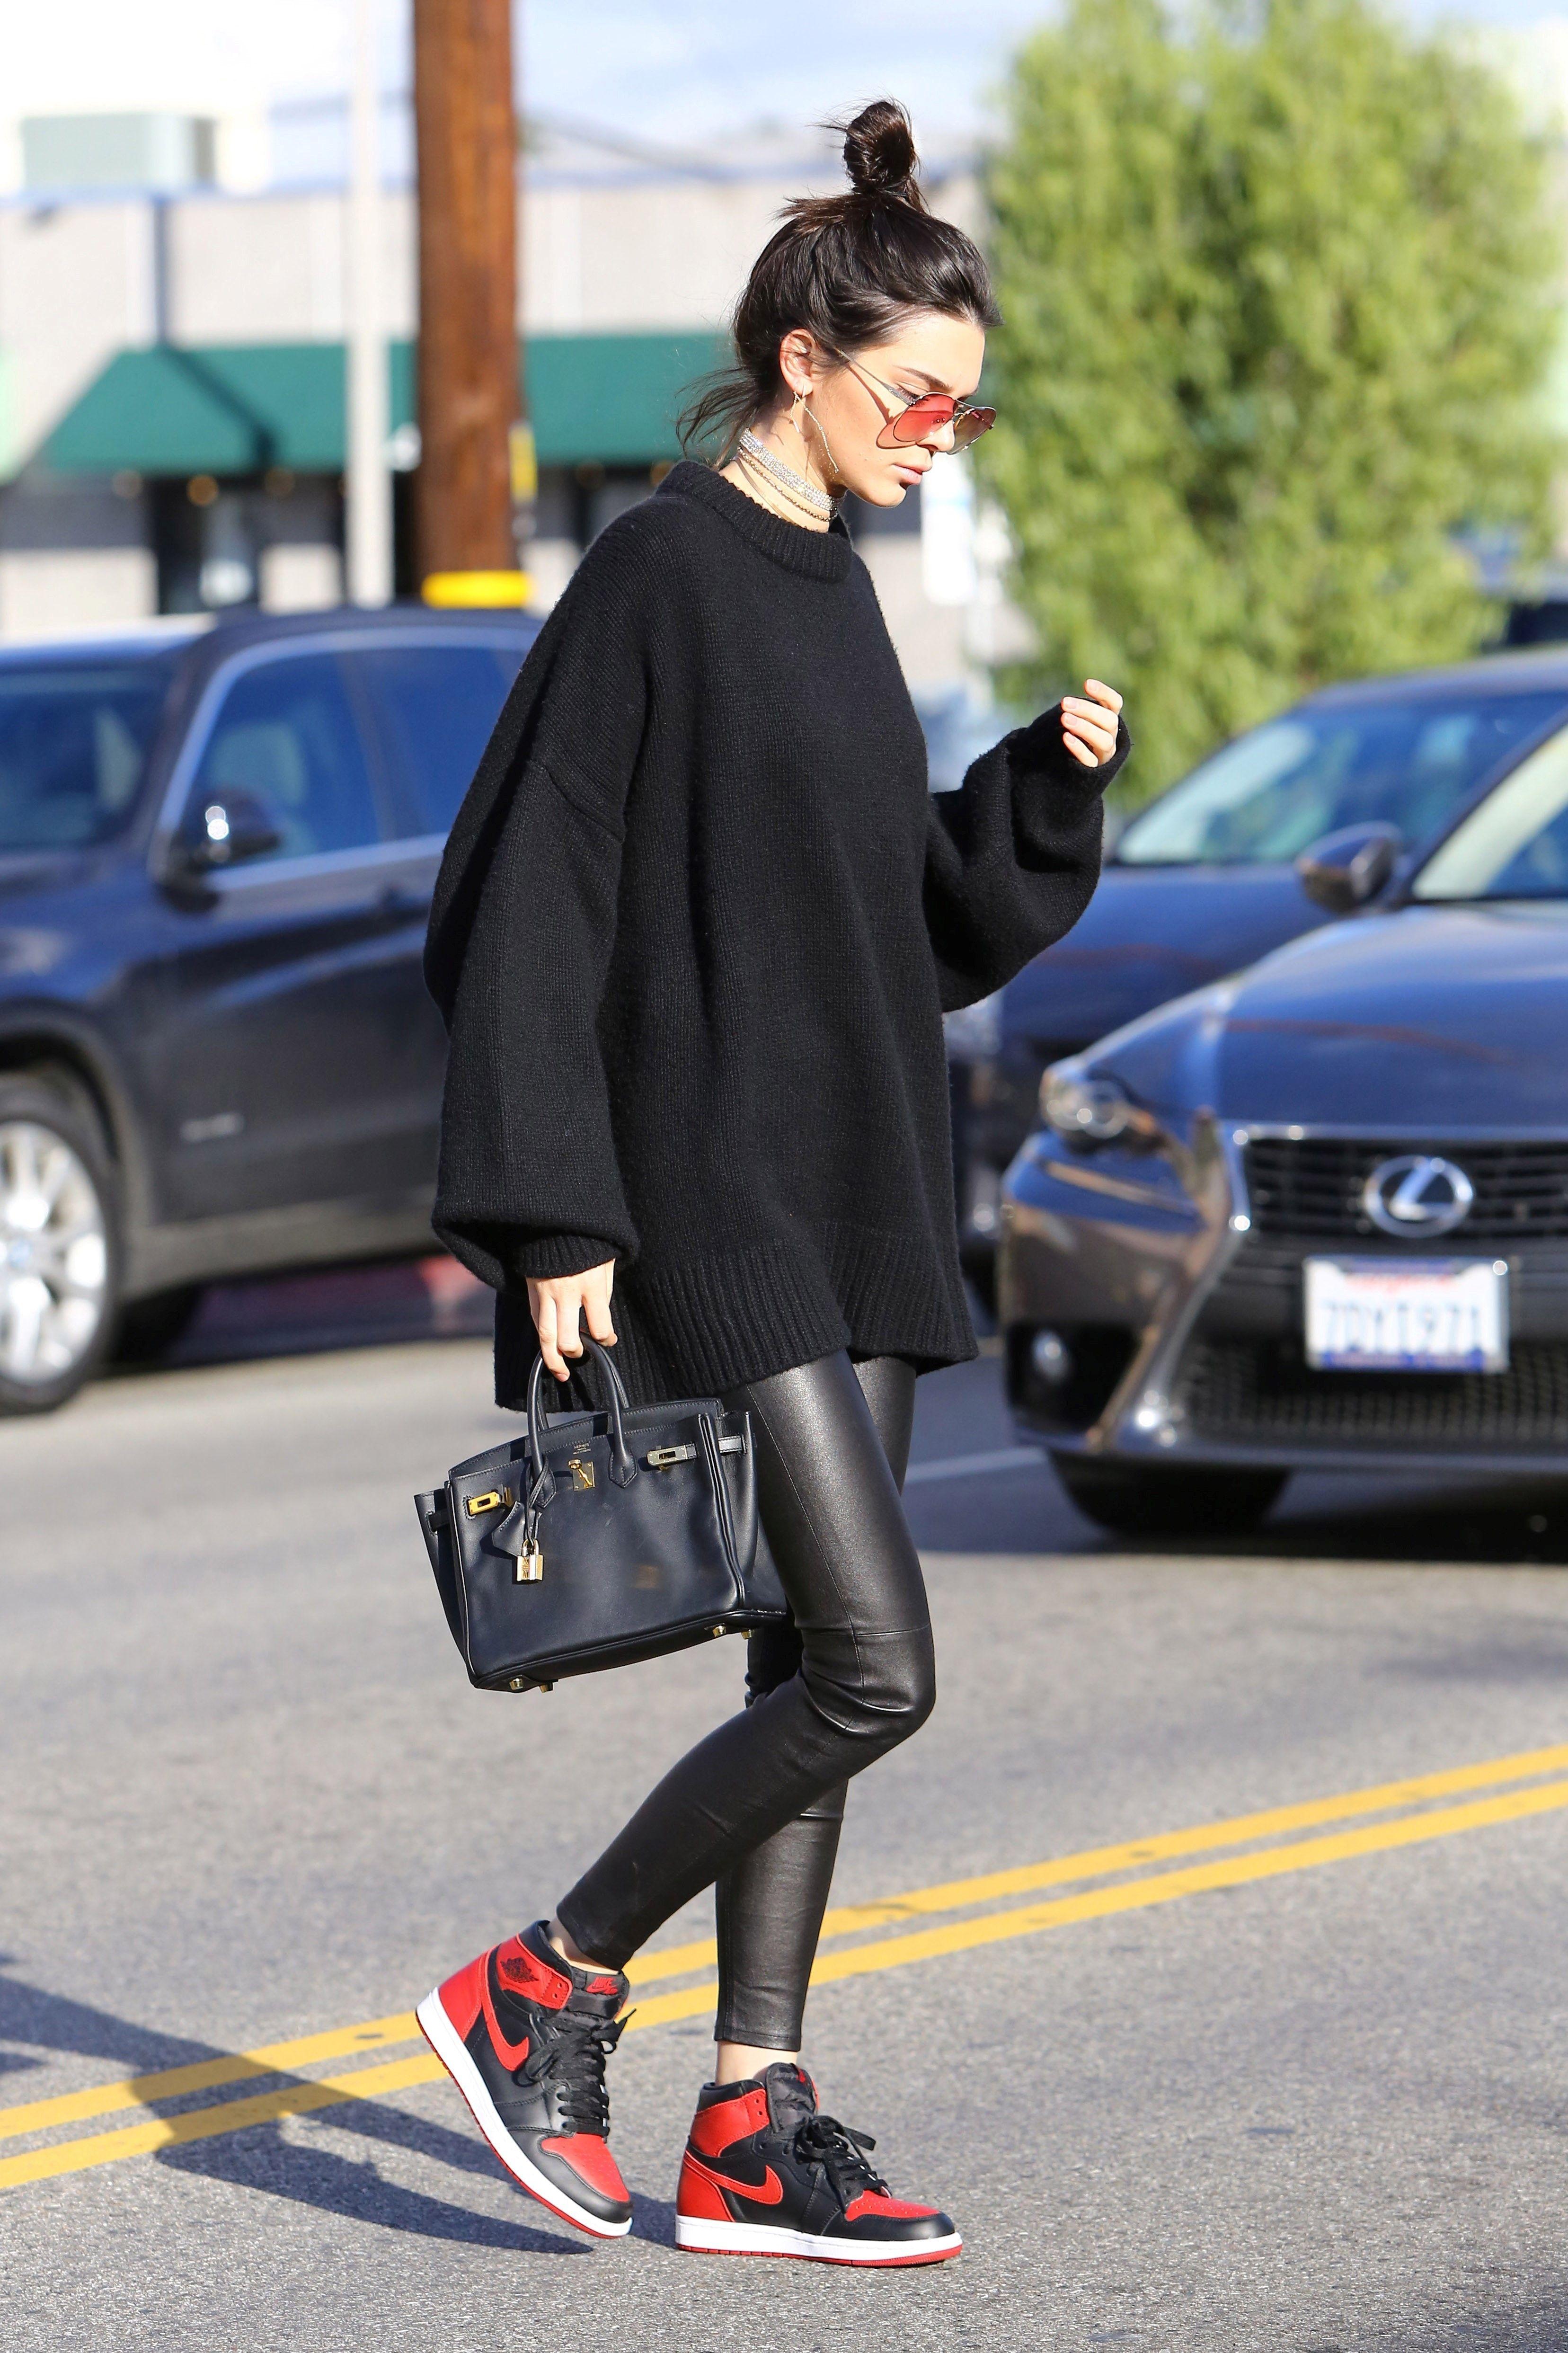 8c780b25418 Kendall Jenner Street Style - Kendall Jenner s Best Fashion Looks